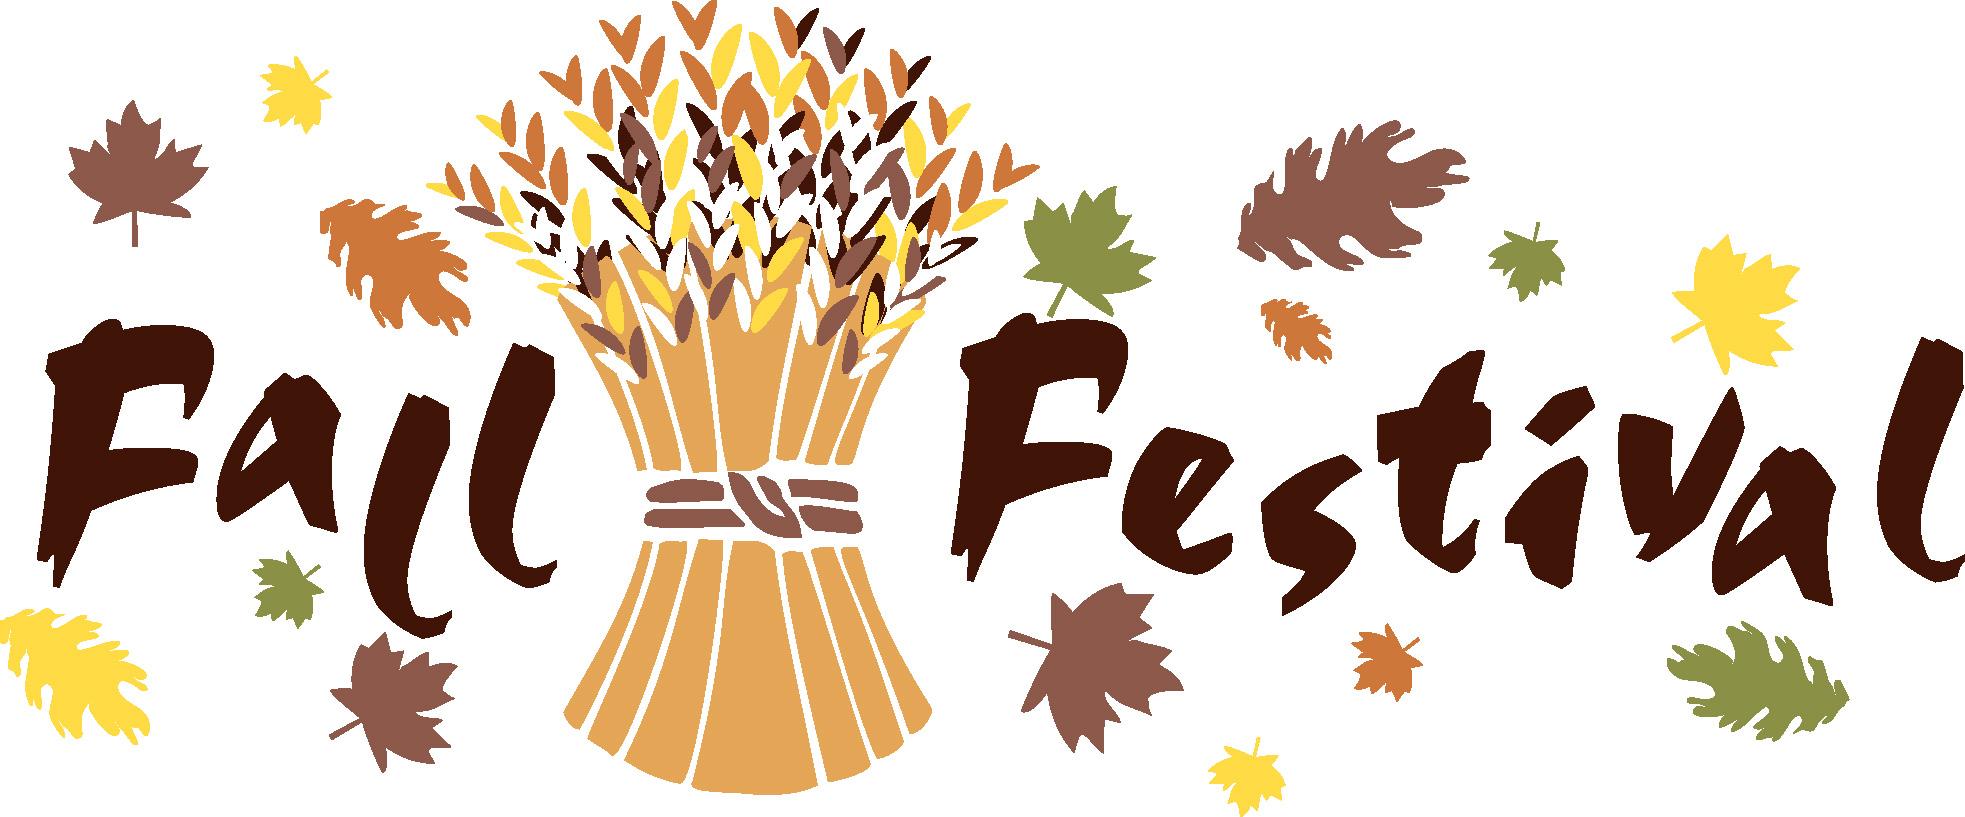 Fall festival clipart 11